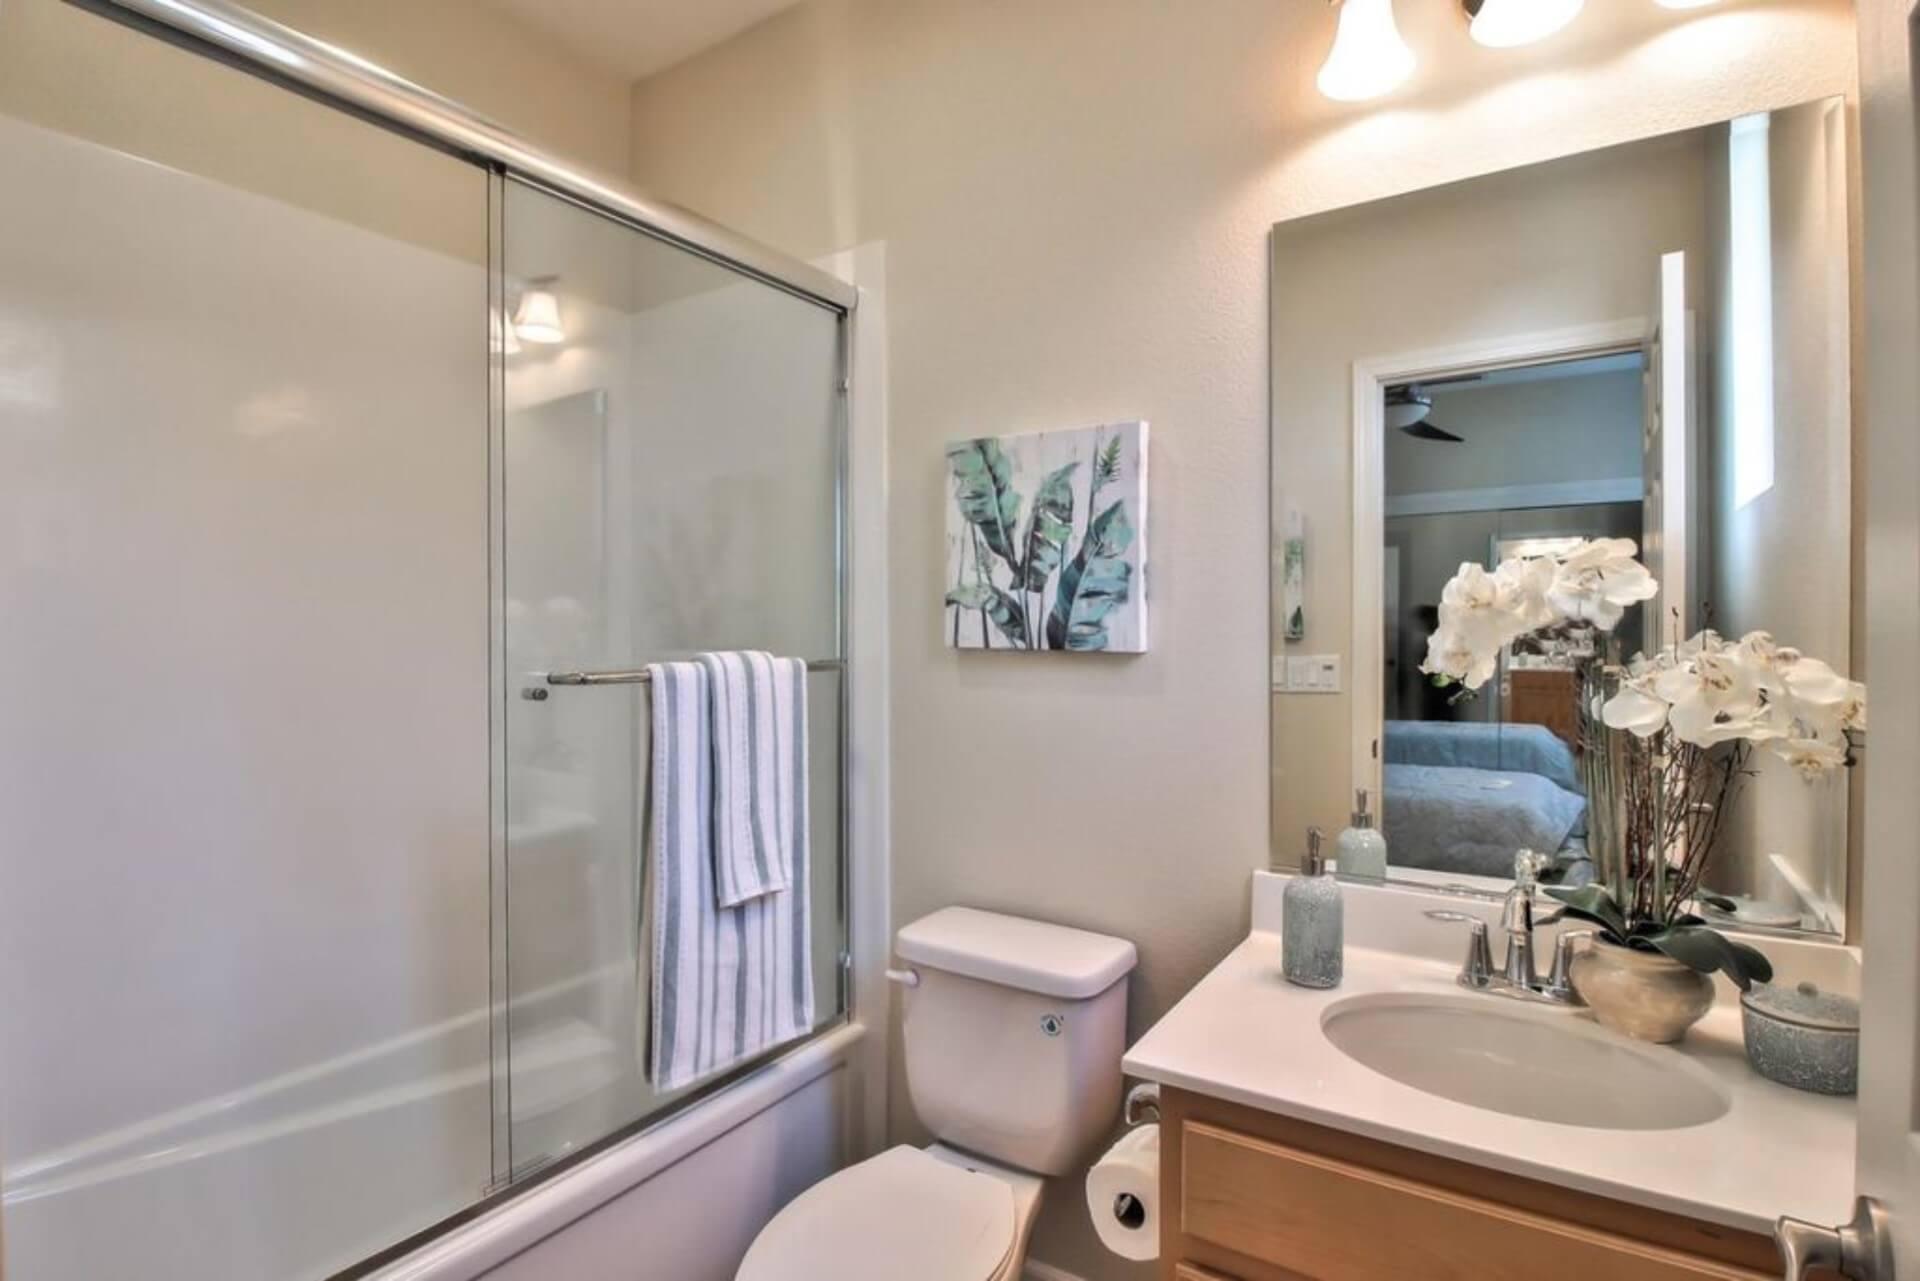 second bath with bath tub and shower head.